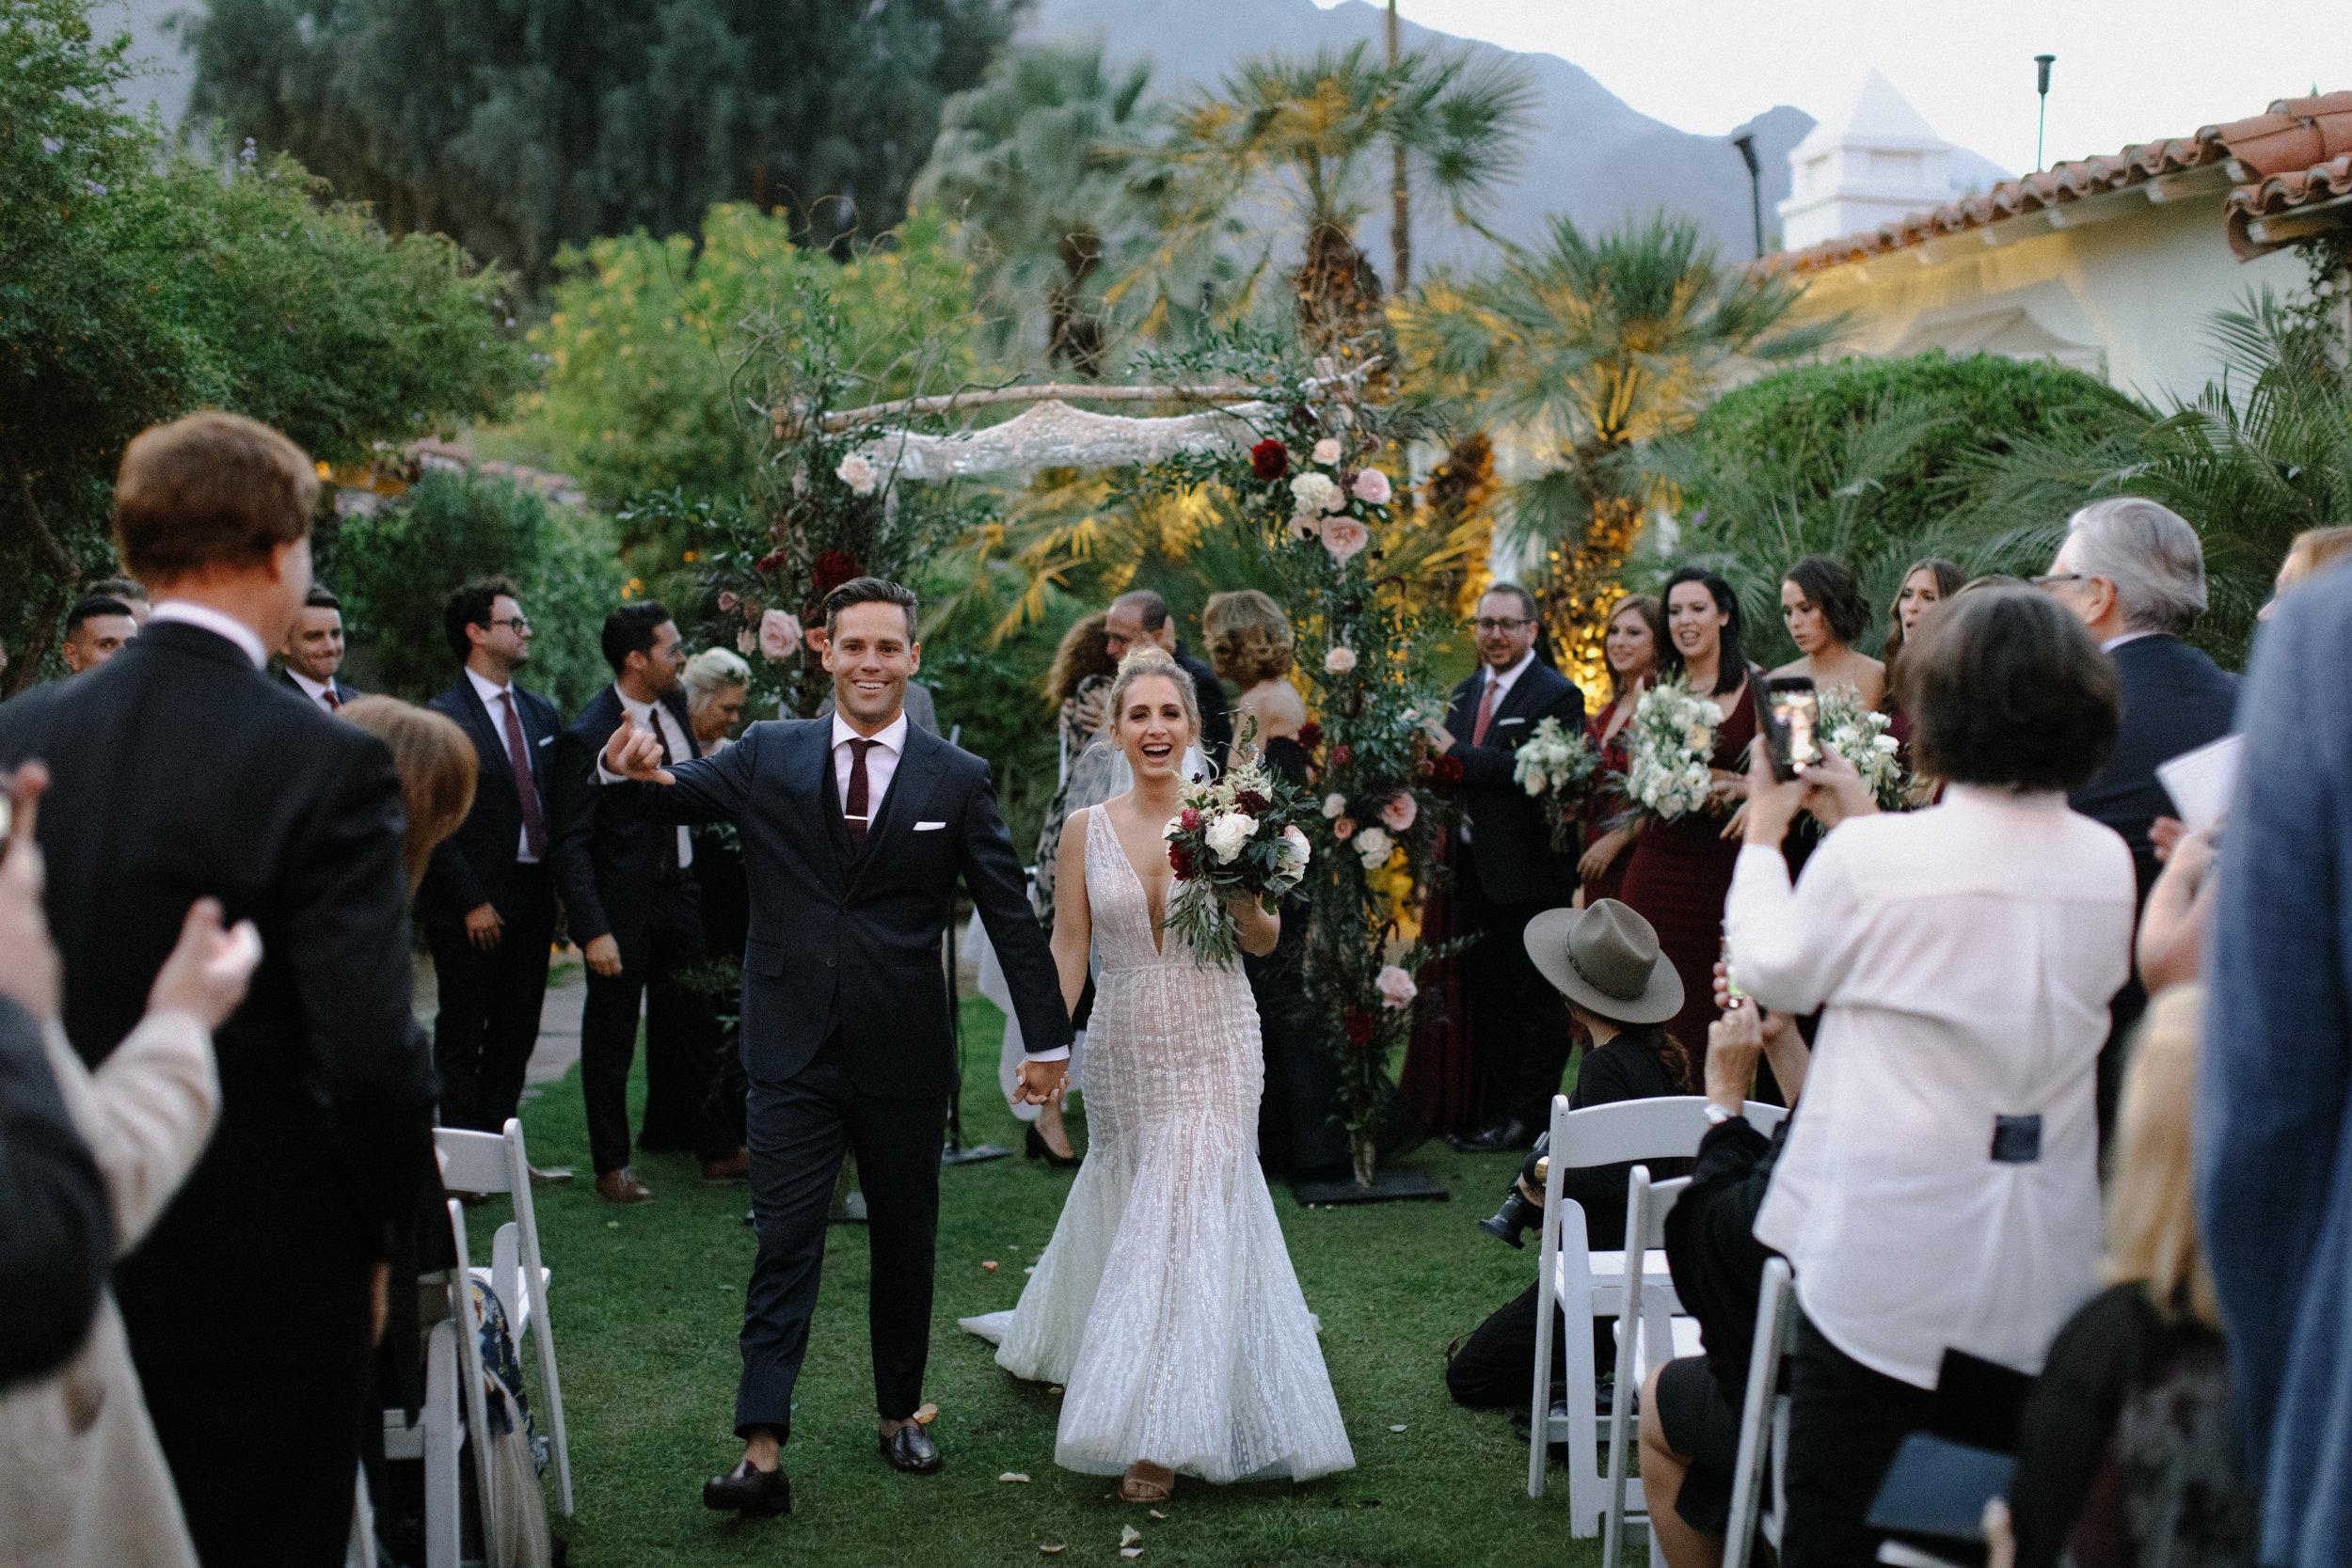 Dara_&_Garrett_Colony_Palms_Hotel_Wedding_Photos-427.jpg